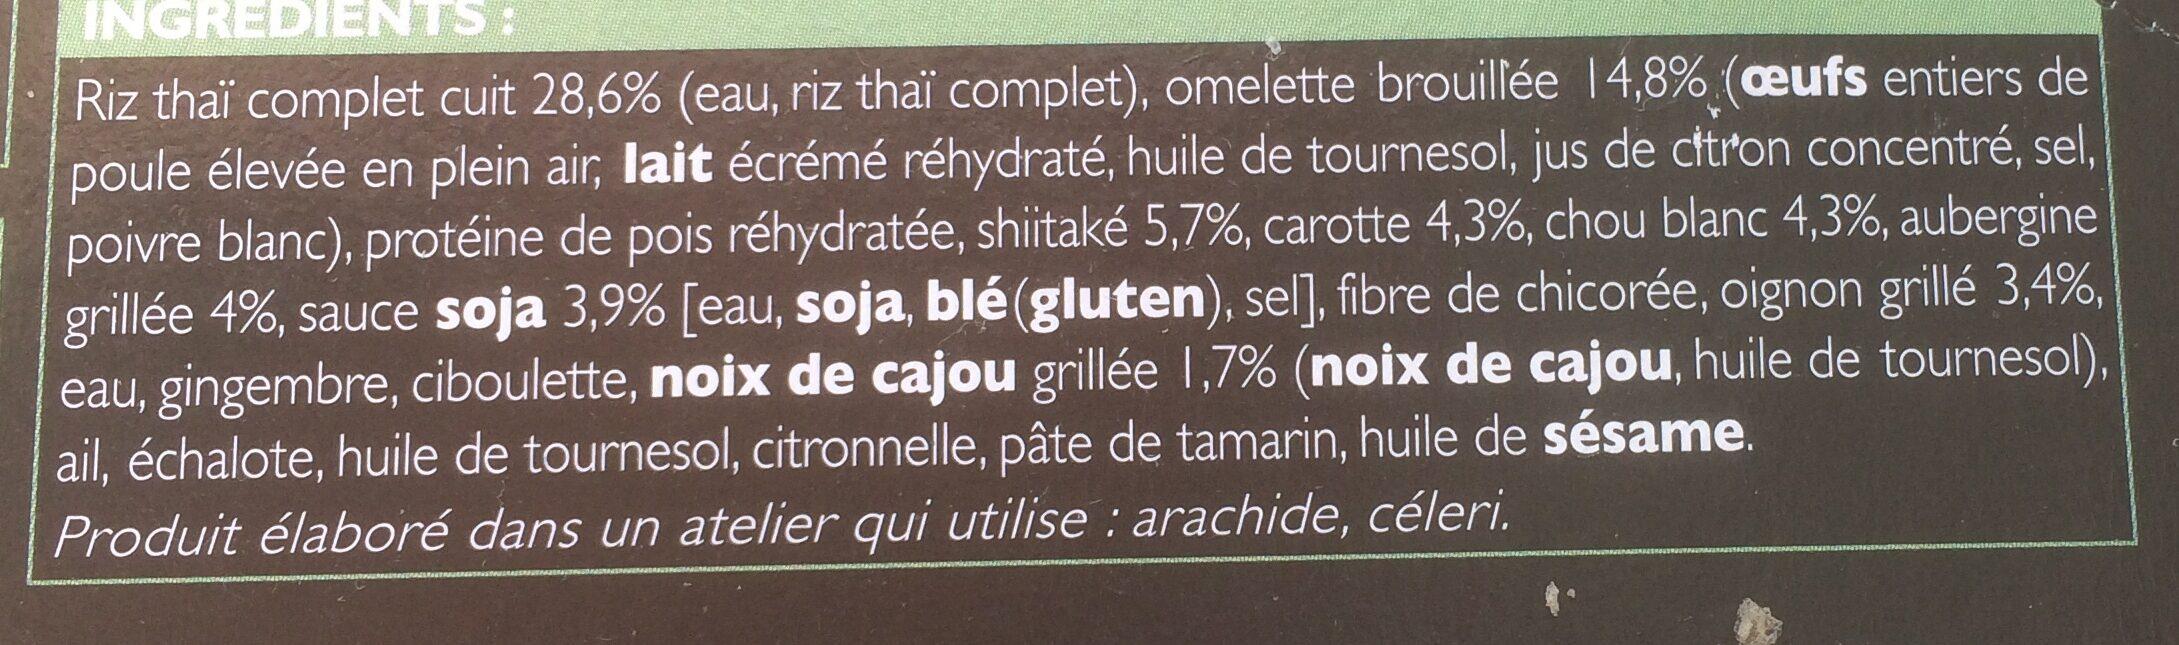 Riz à la Thaïlandaise (Veggie) - Inhaltsstoffe - fr